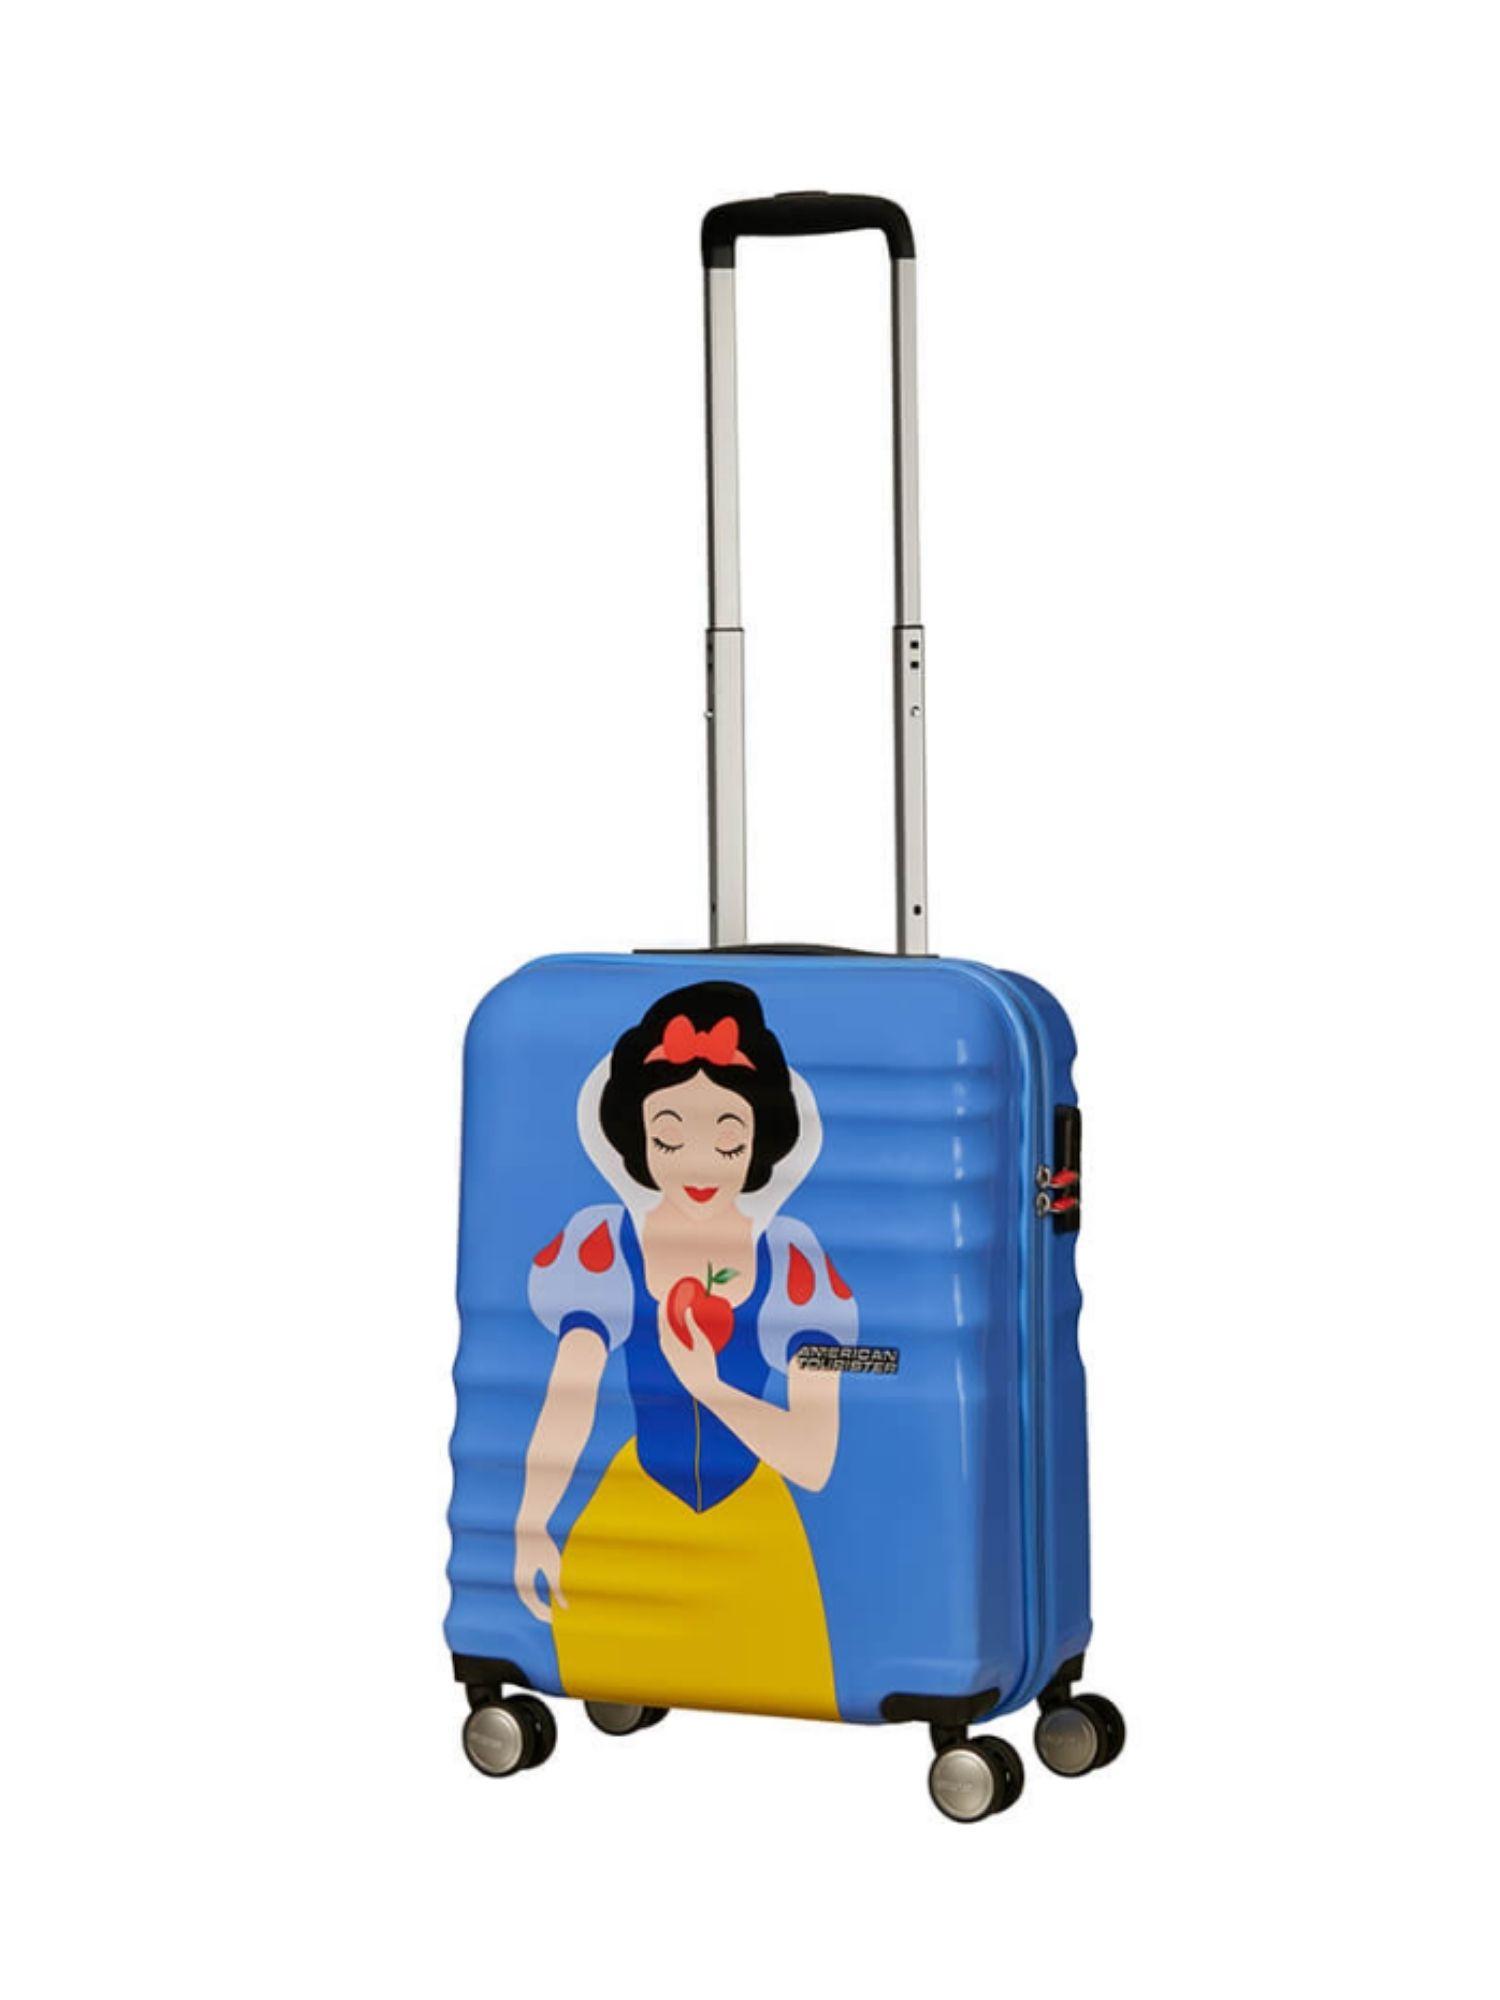 Trolley American Tourister 4 ruote 55 cm. Wavebreaker Disney Snow White aperta 2